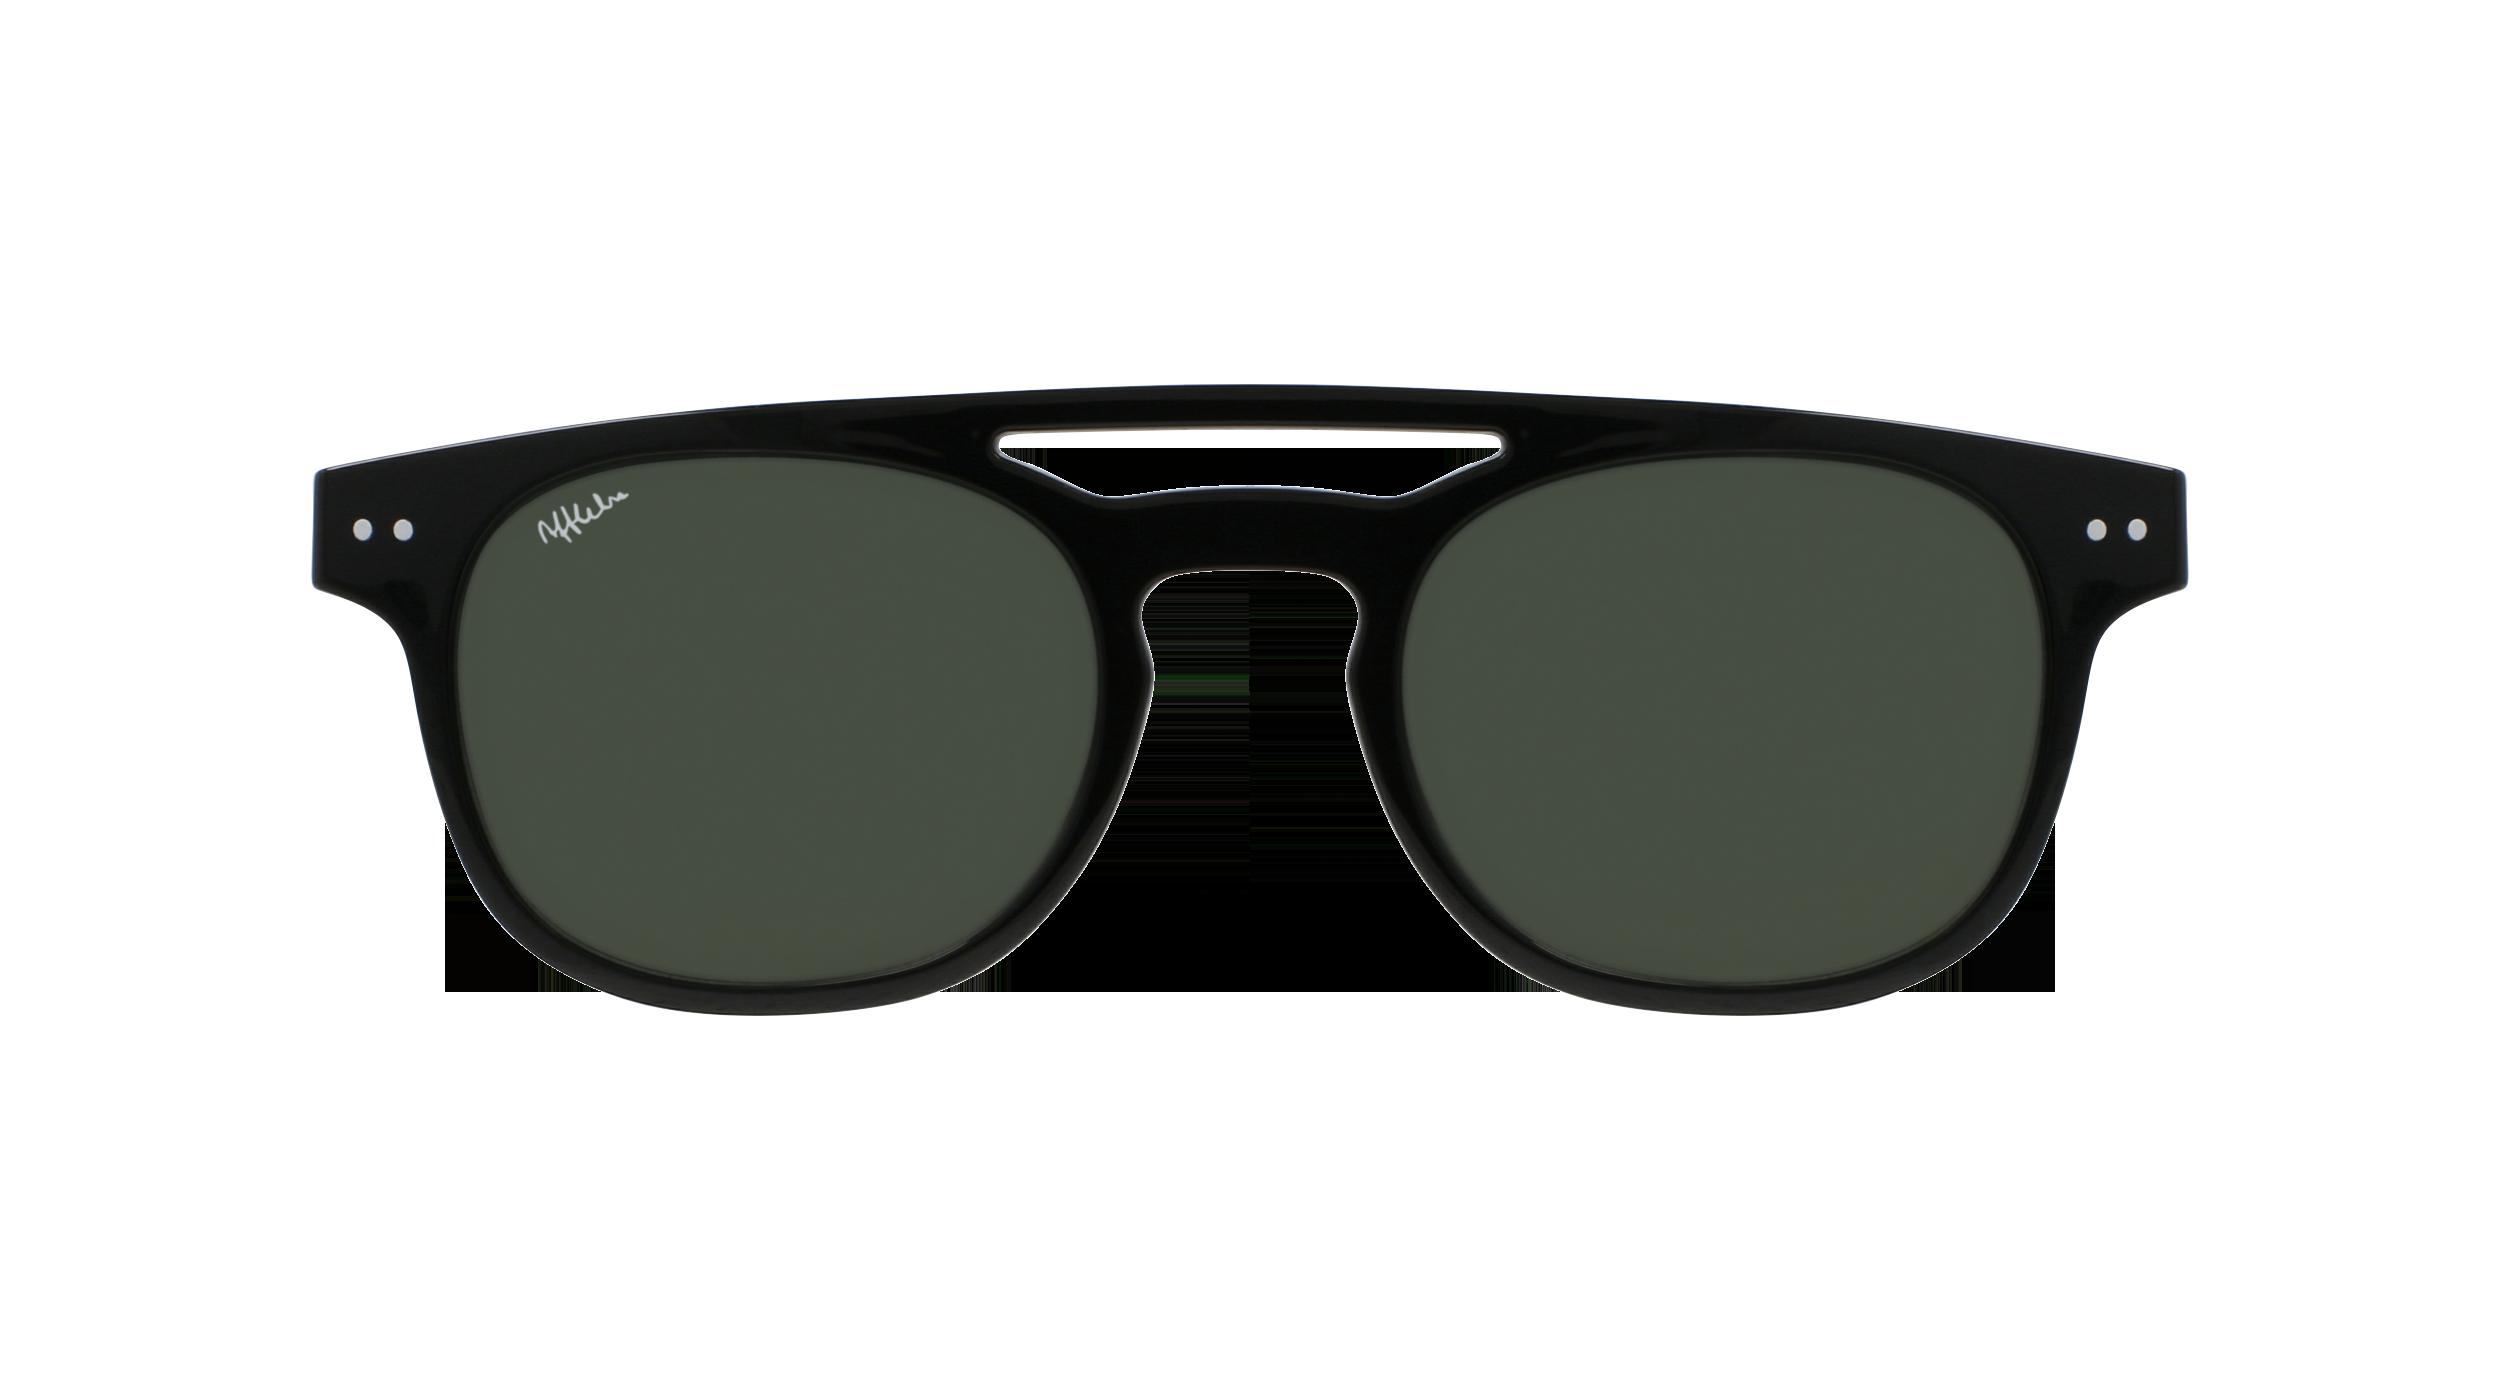 afflelou/france/products/smart_clip/clips_glasses/07630036436165.png